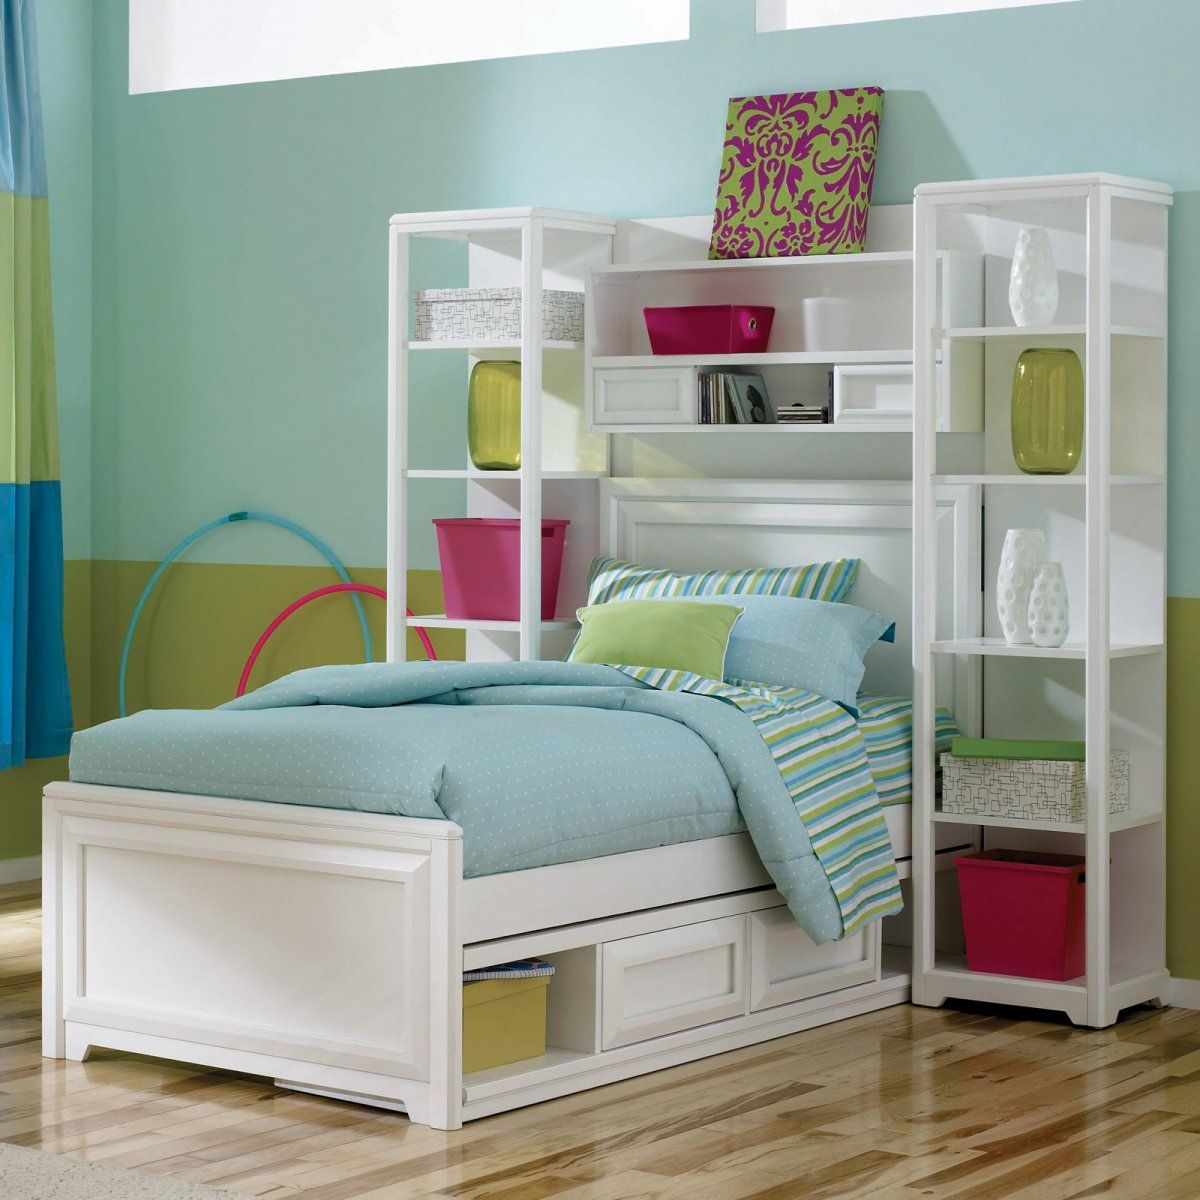 Remarkable Teenage Bedroom Storage Ideas Gallery - Best idea home ...